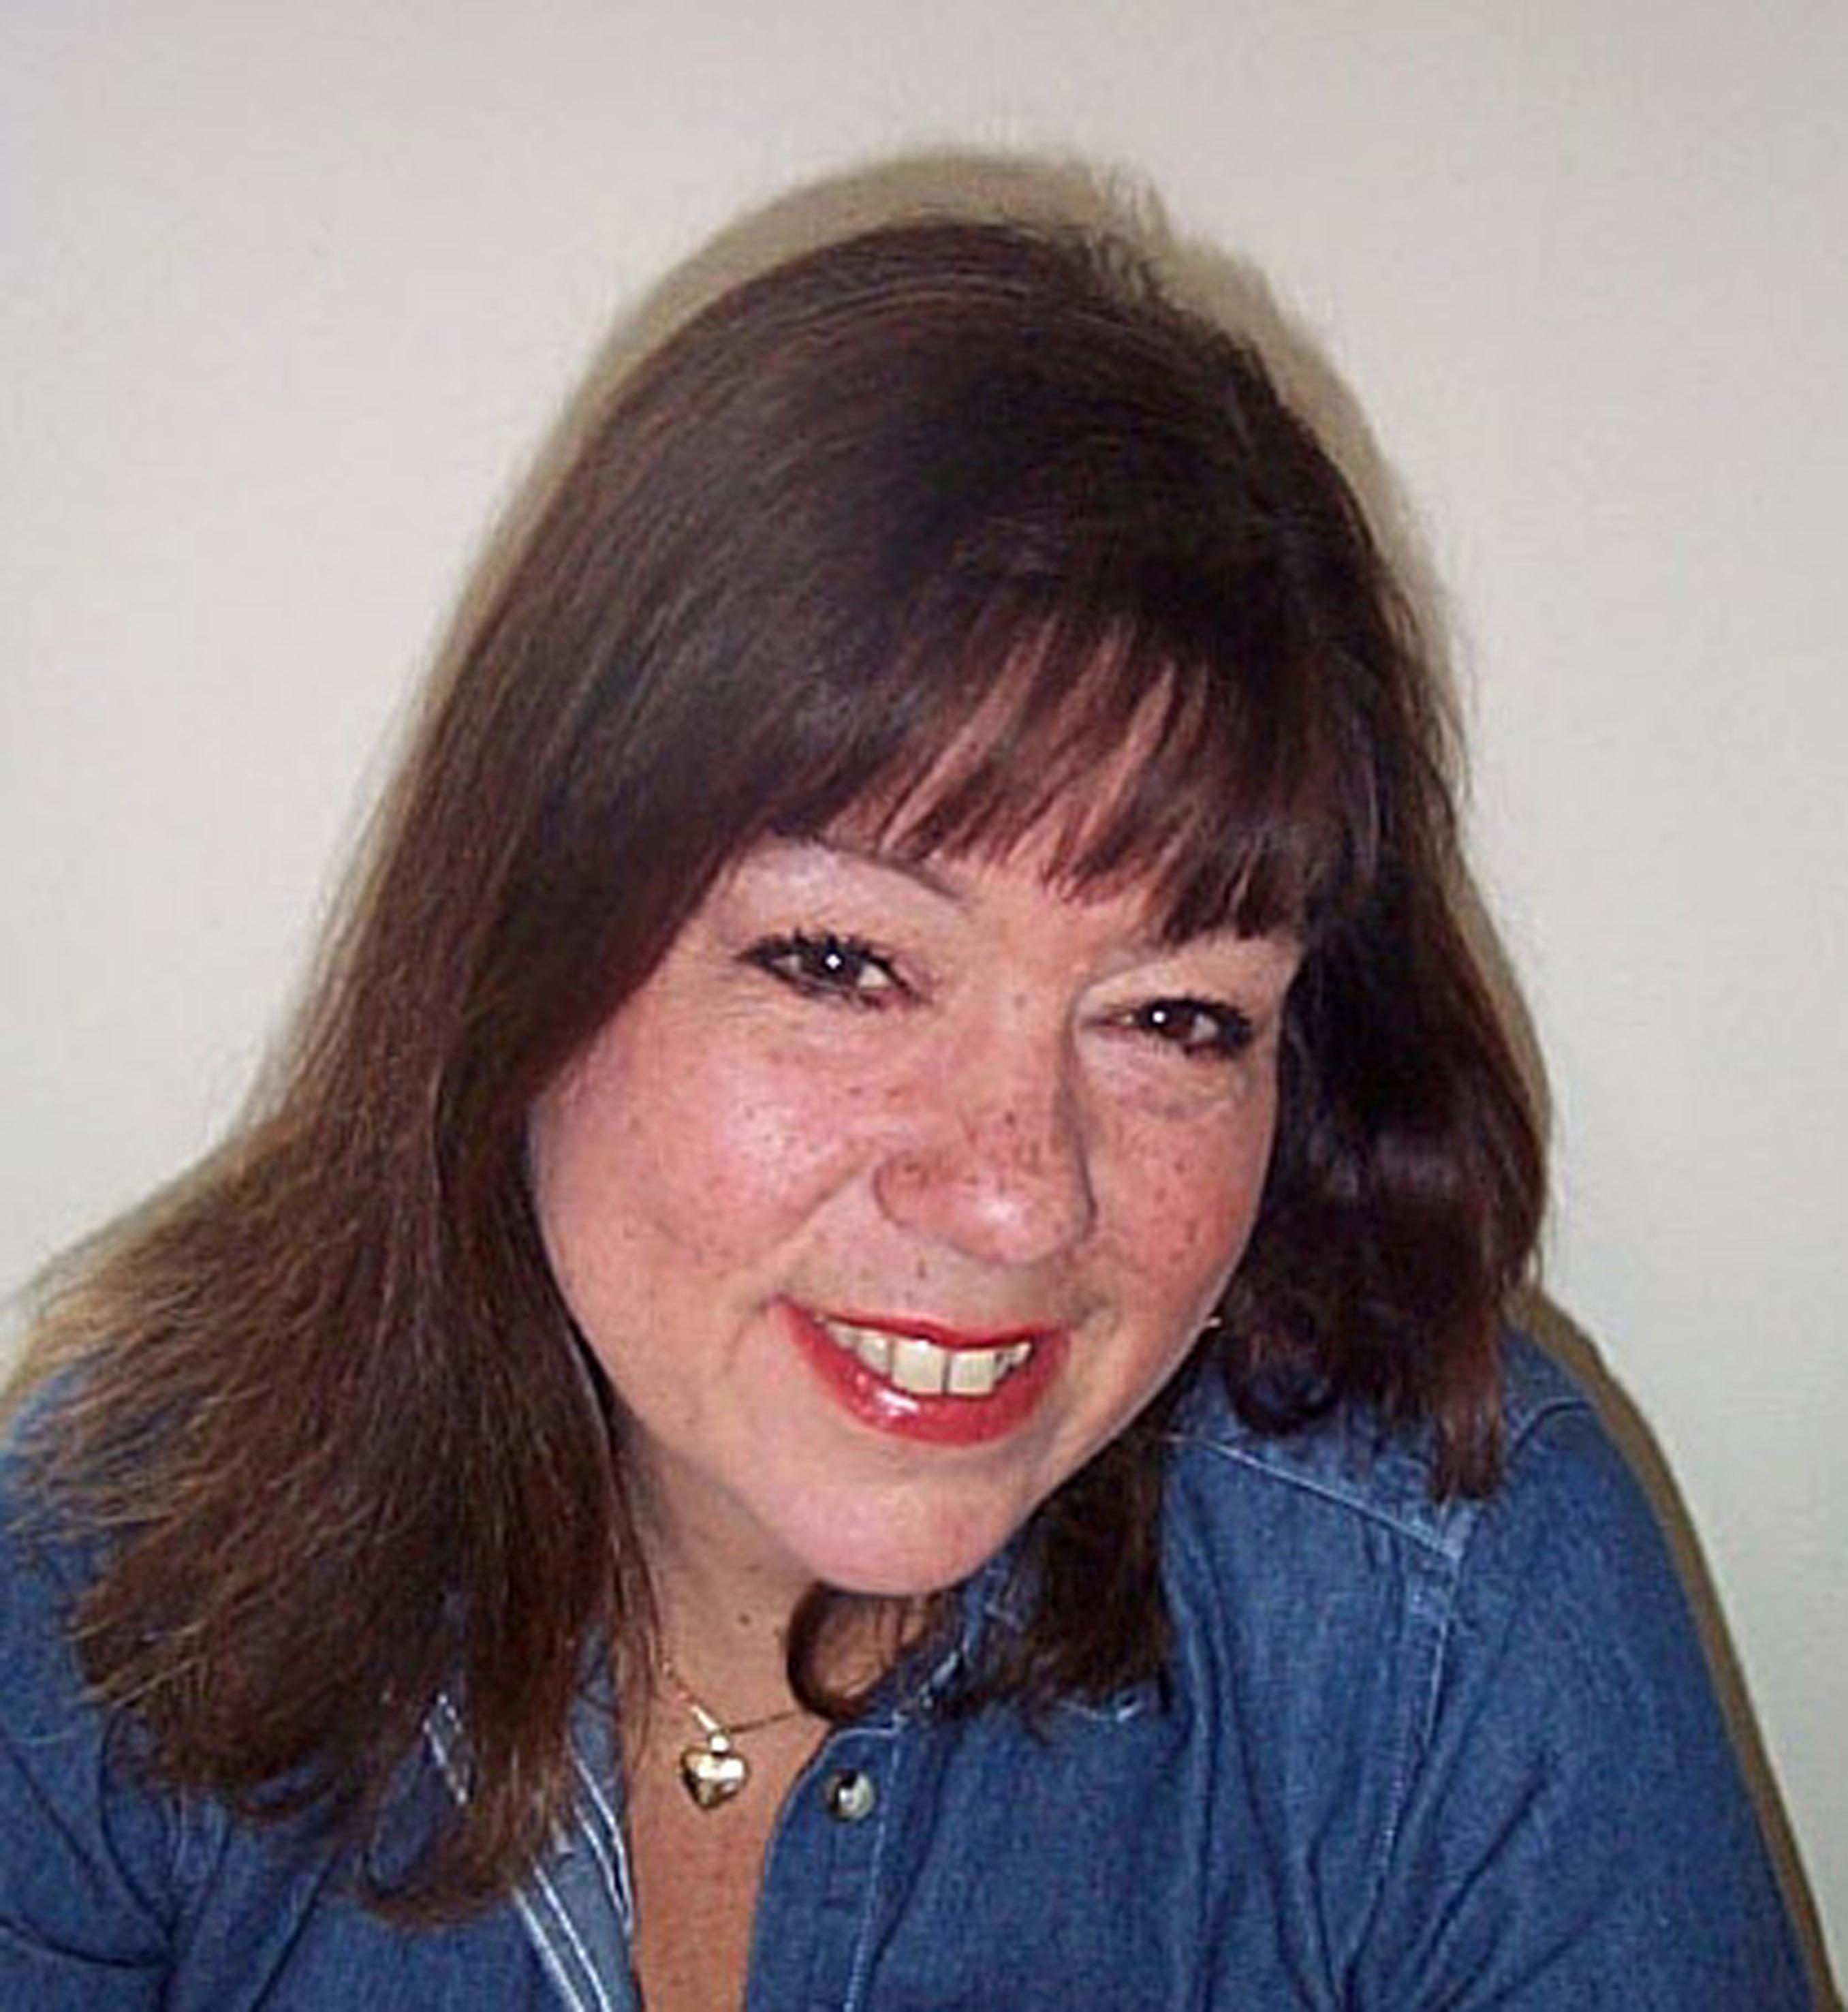 Heather Anita Couper